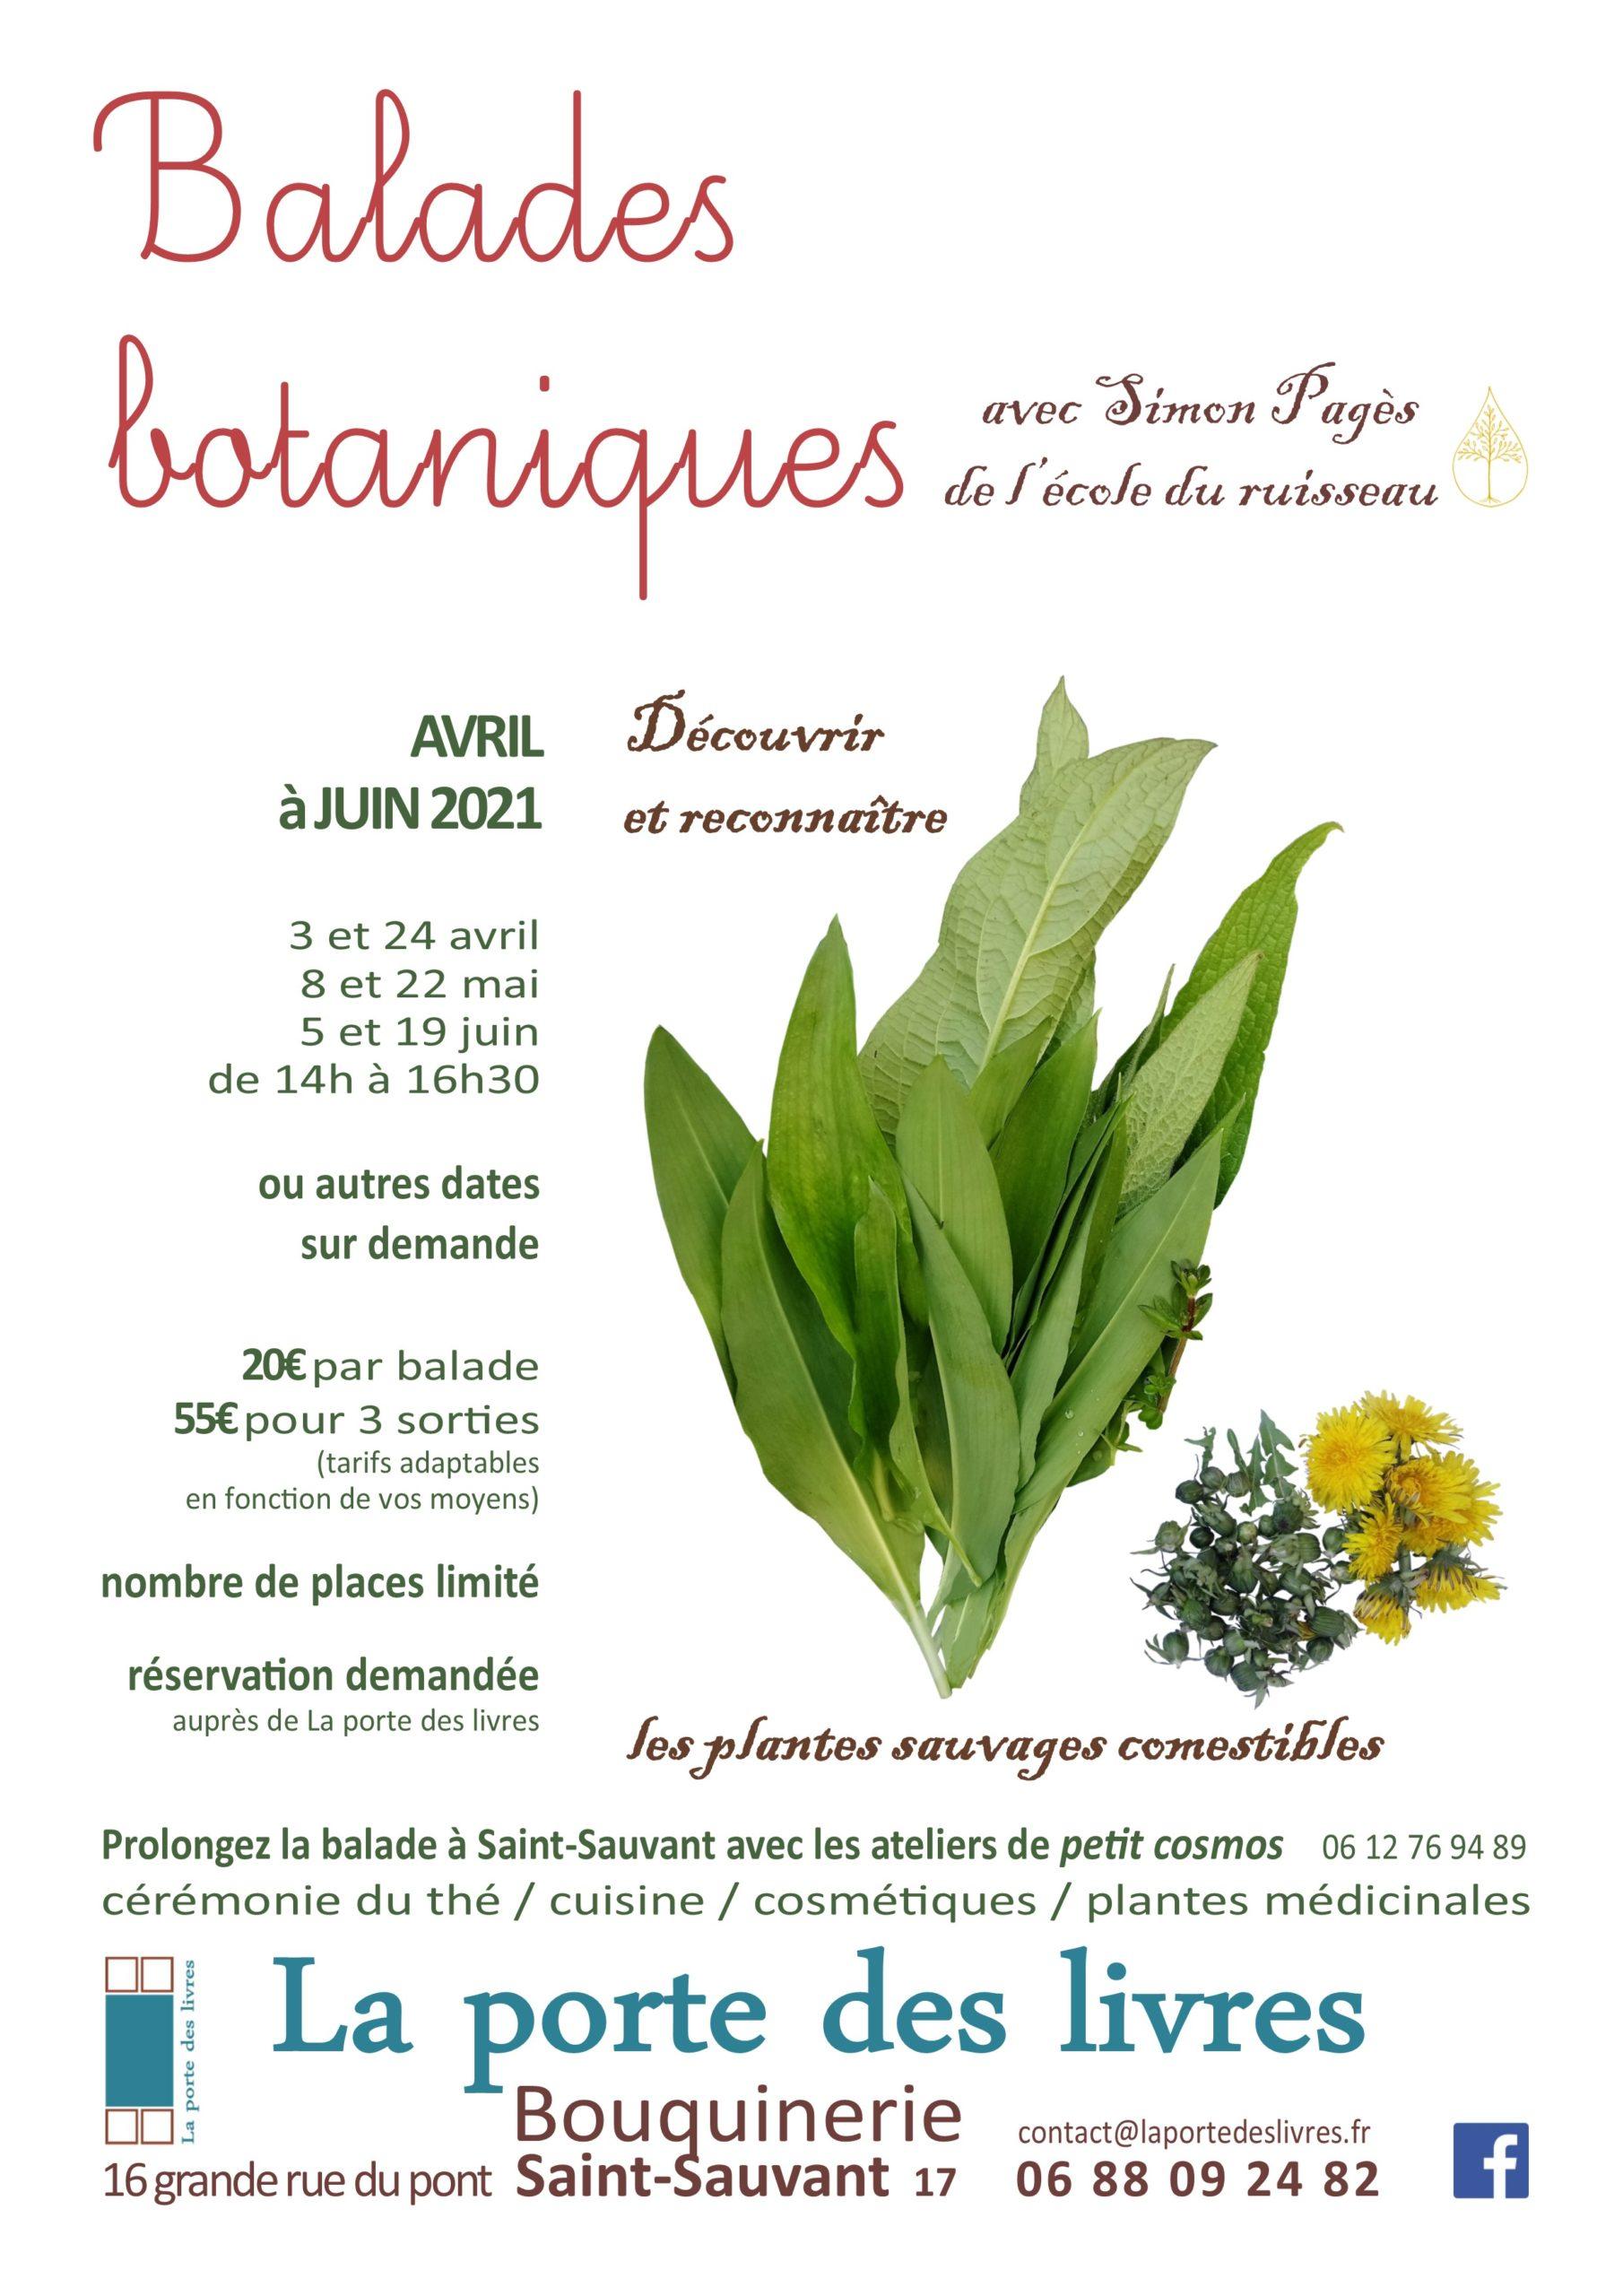 Balades botaniques avec Simon Pagès